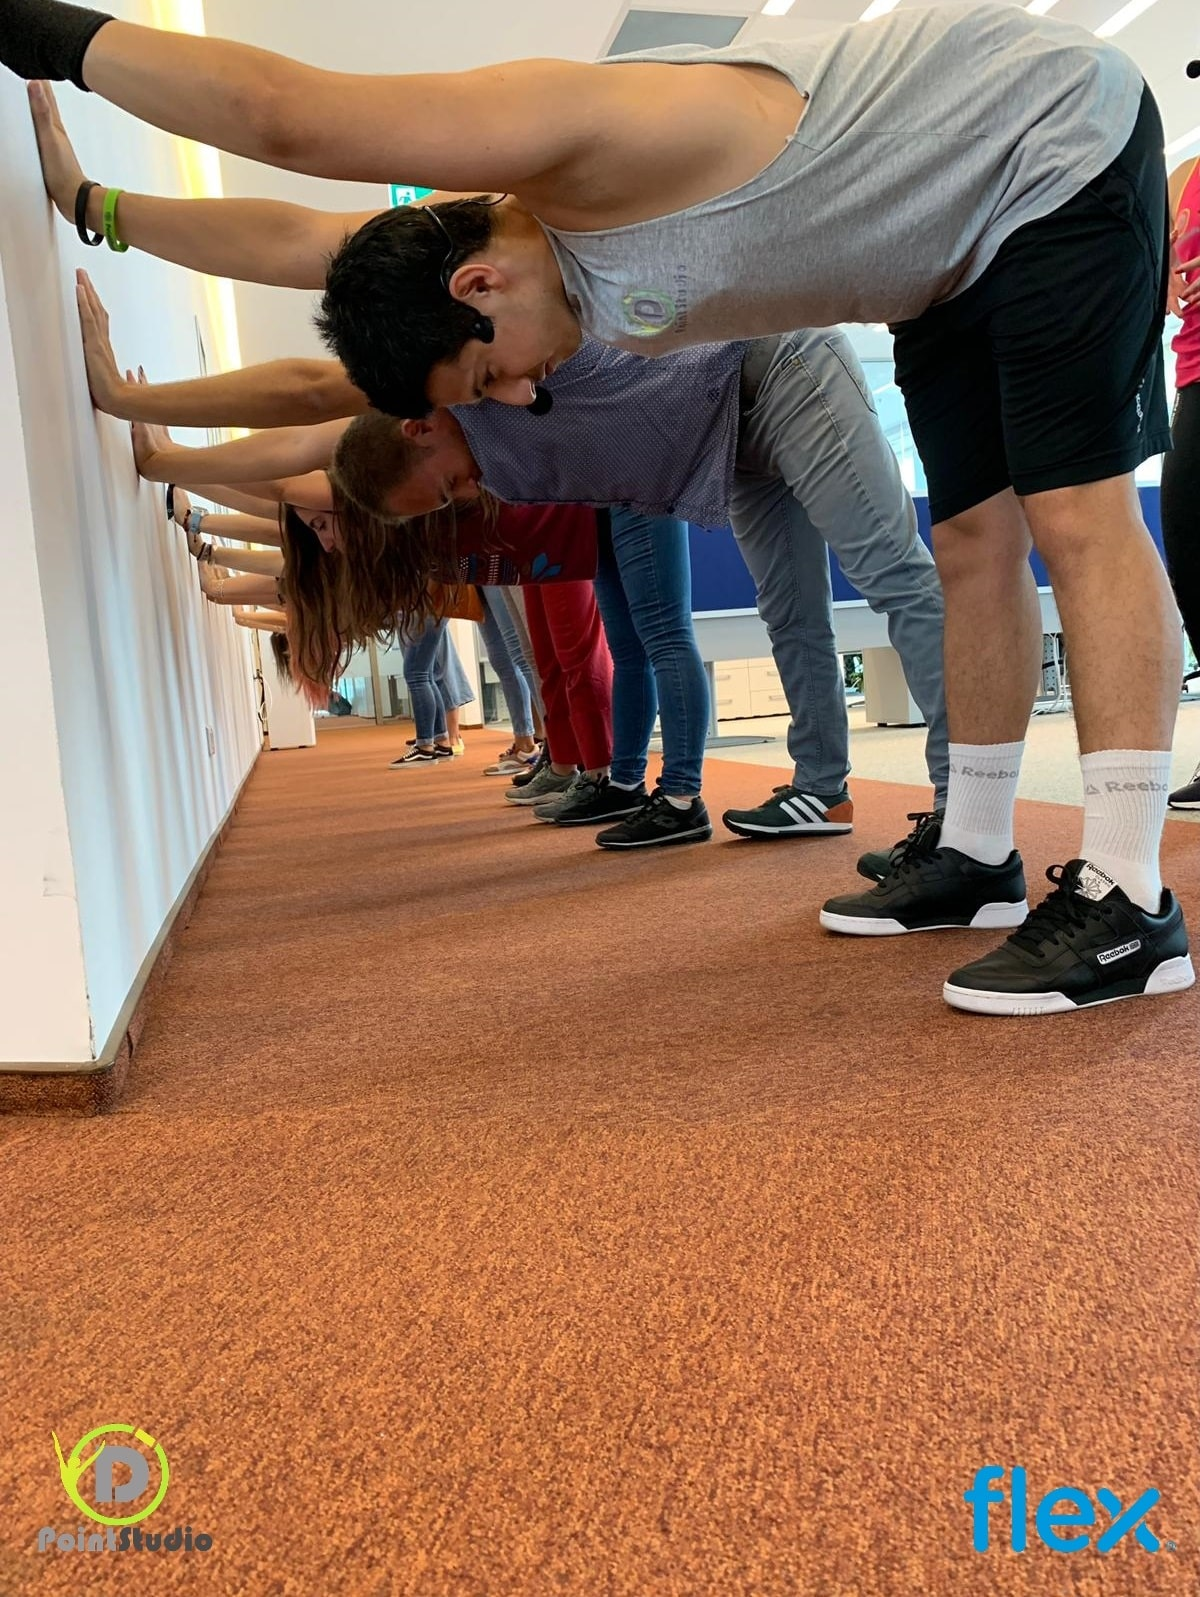 Gathering & Team Work - at Flex Openville